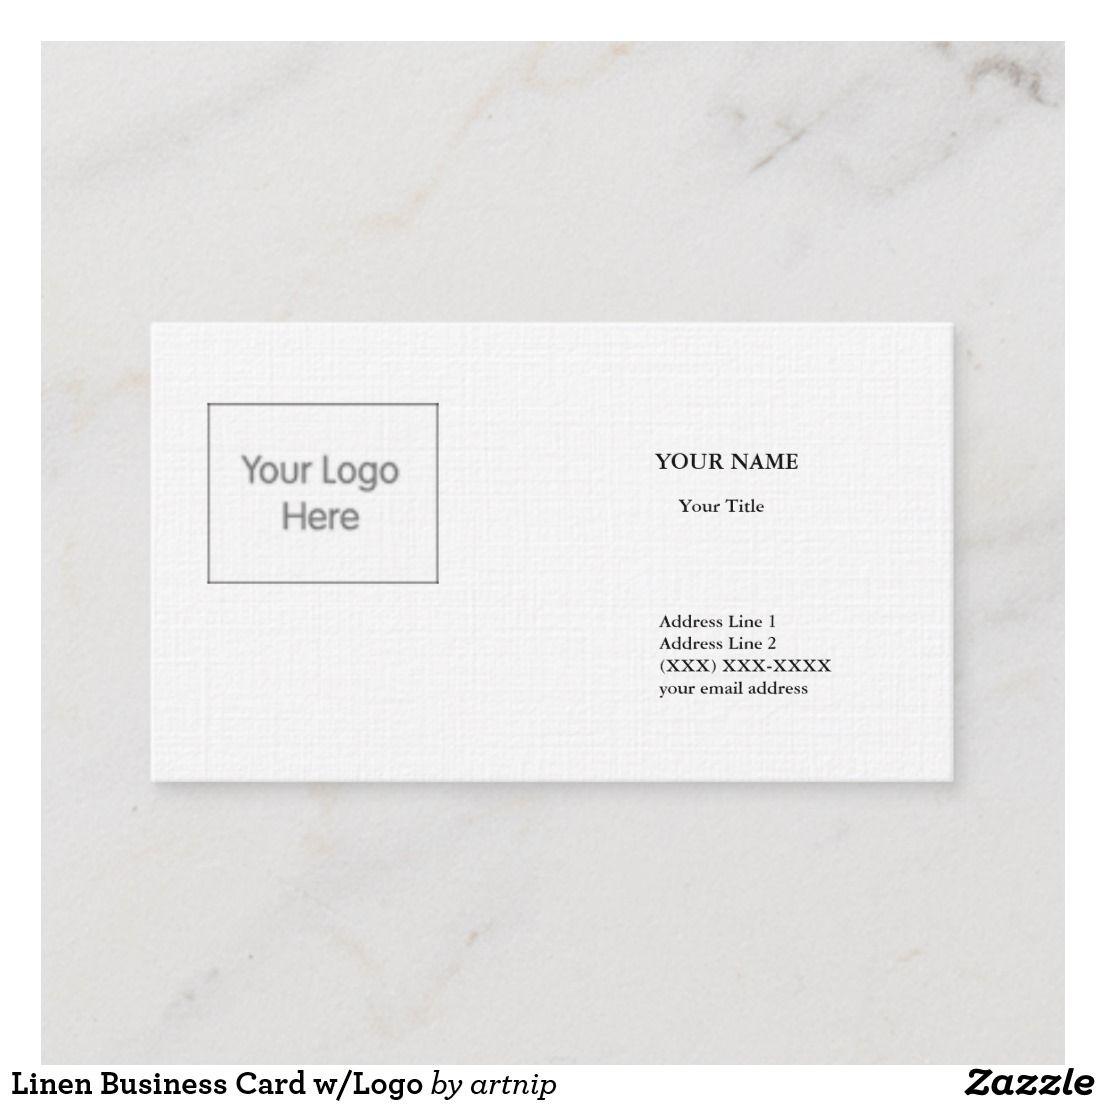 Linen Business Card W Logo Zazzle Com Linen Business Cards Photo Business Cards W Logos